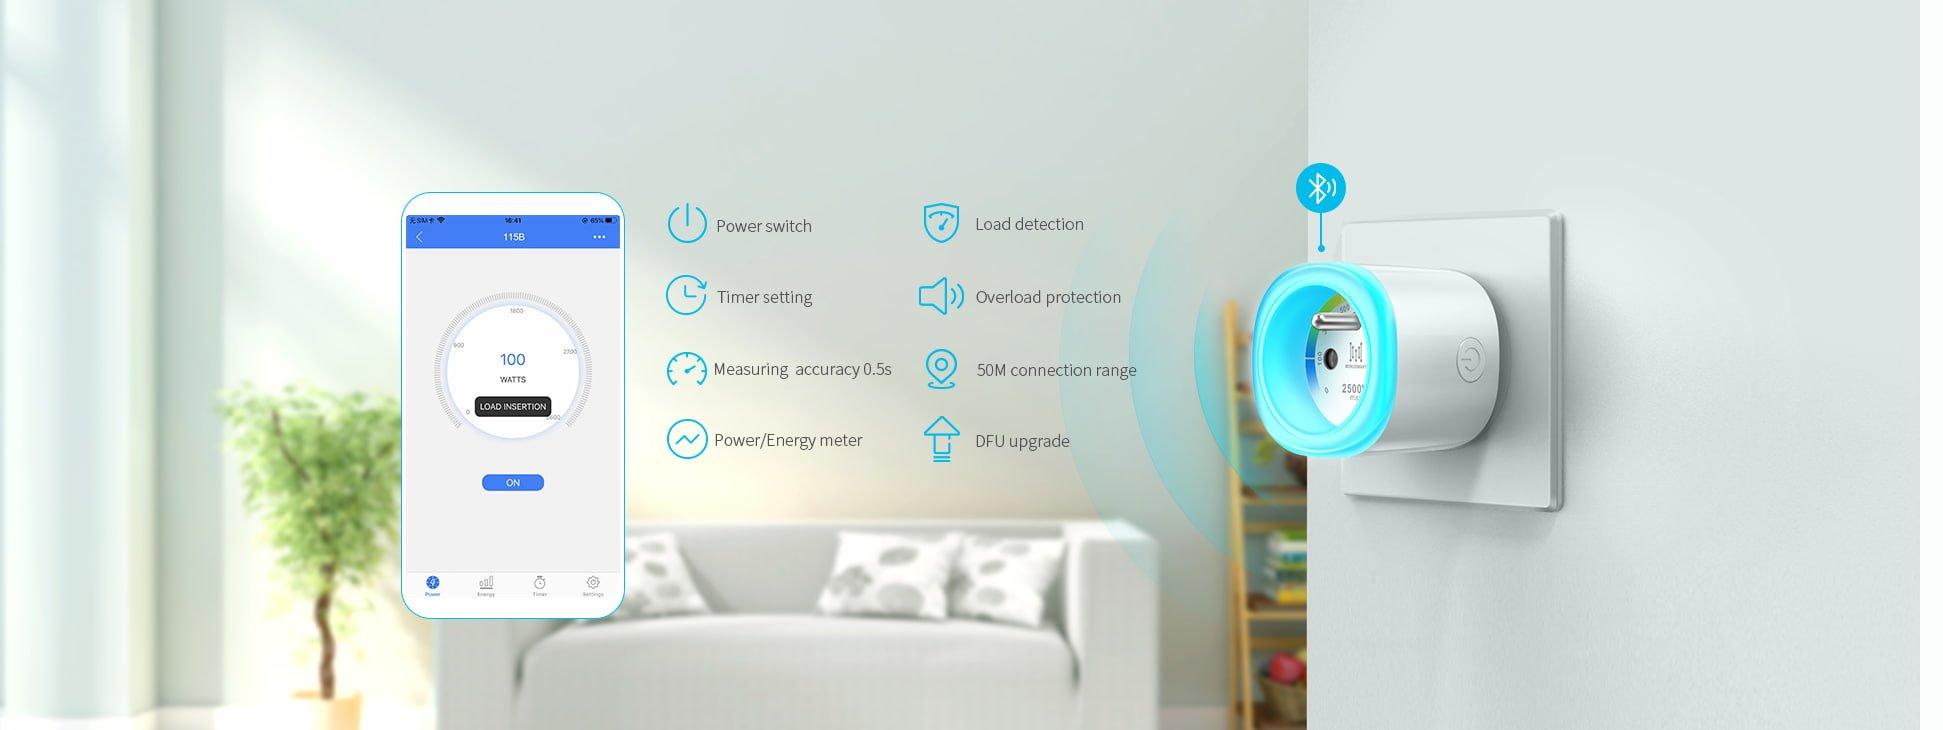 Bluetooth Smart Plug MK115B Product applications